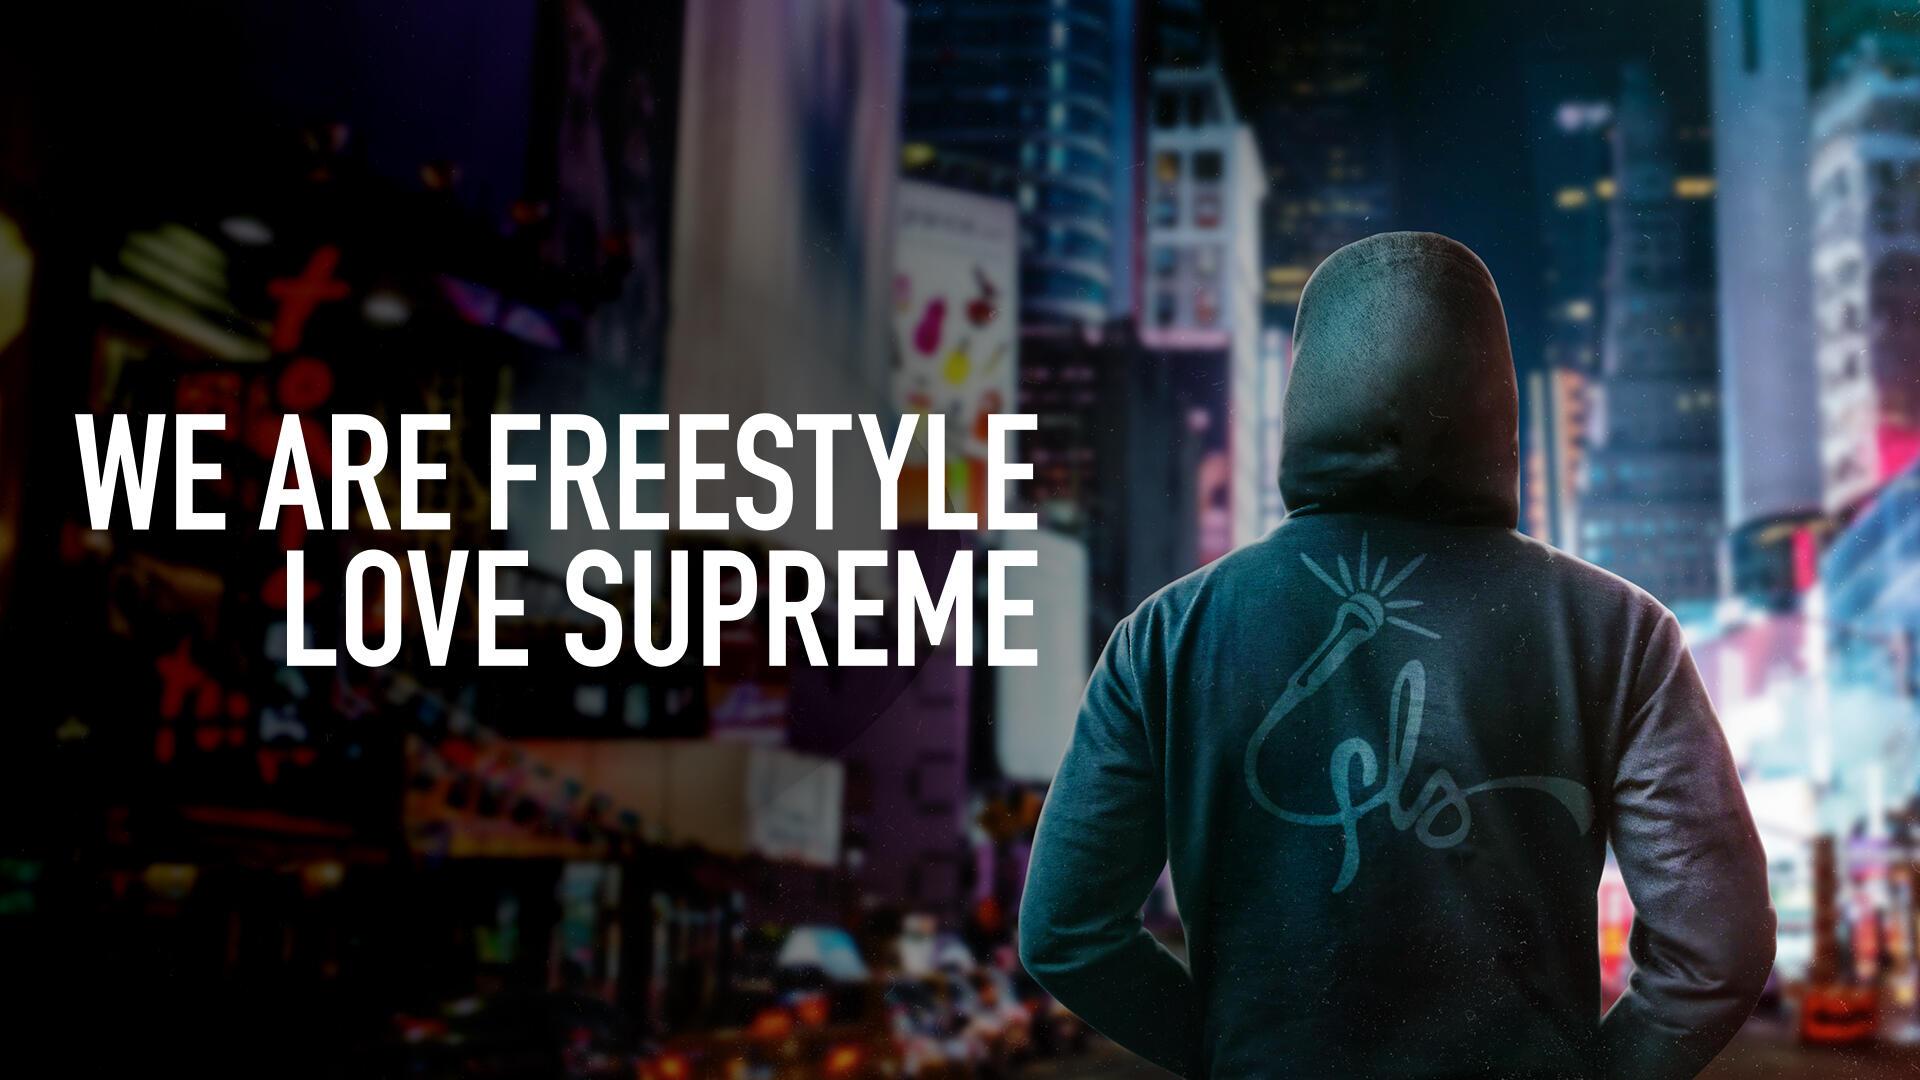 We_Are_Freestyle_Love_Supreme_16x9